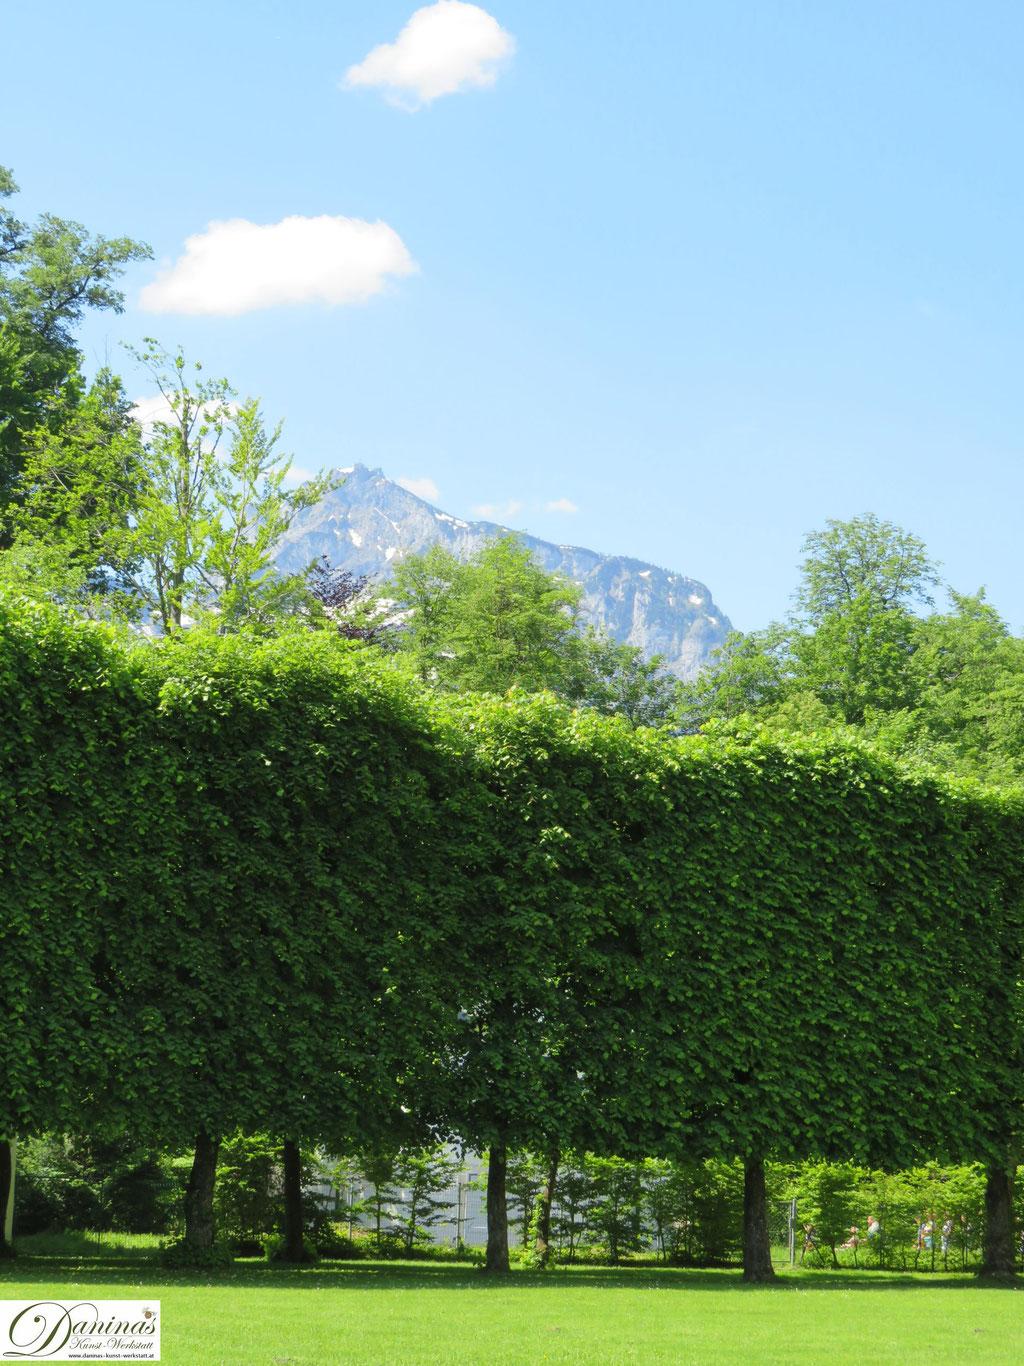 Schloss Hellbrunn Park, Salzburg. Blick zum sagenumwobenen Untersberg